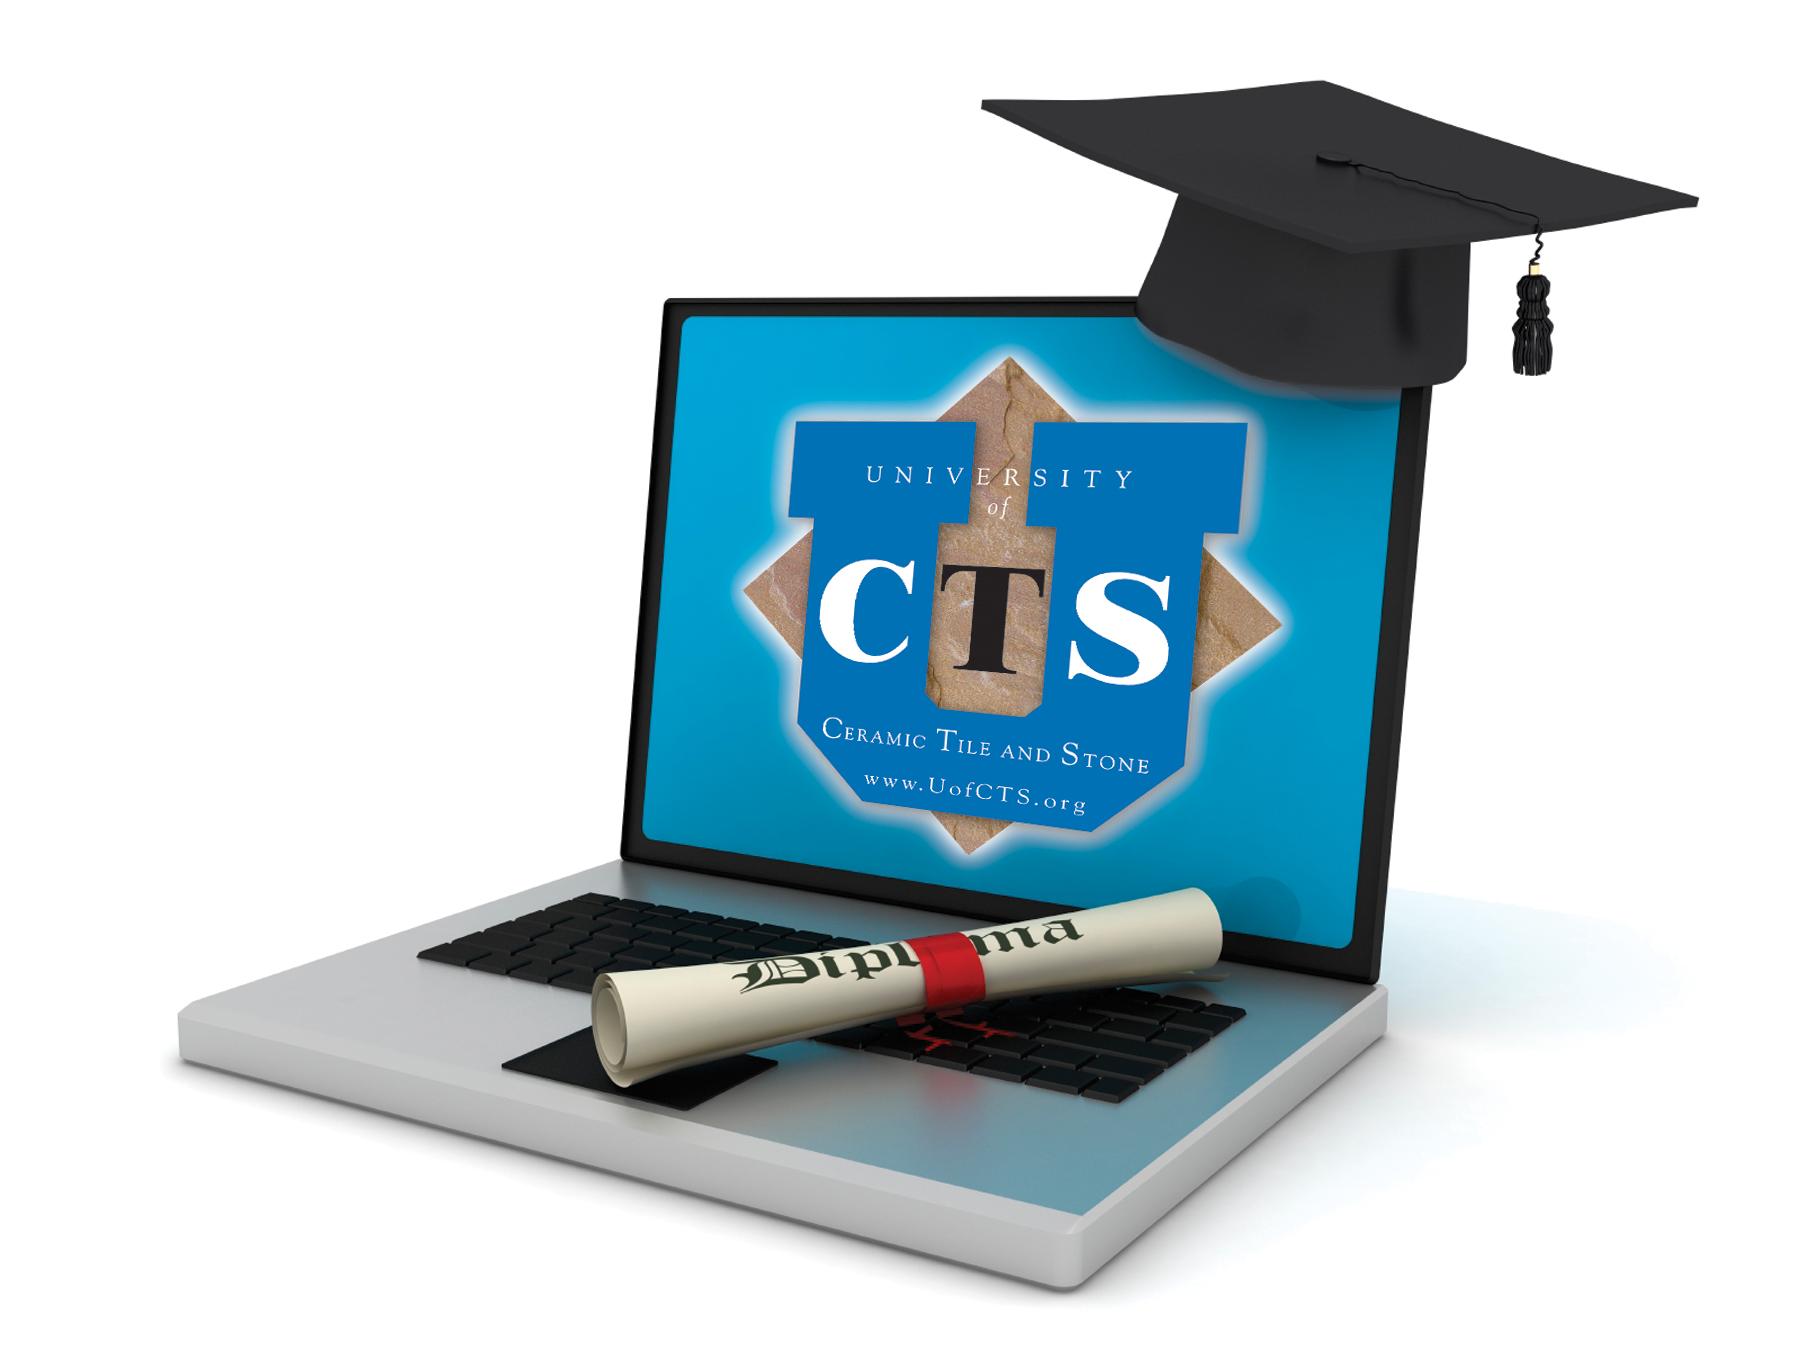 Customized Tile Training Programs - CTaSC.com